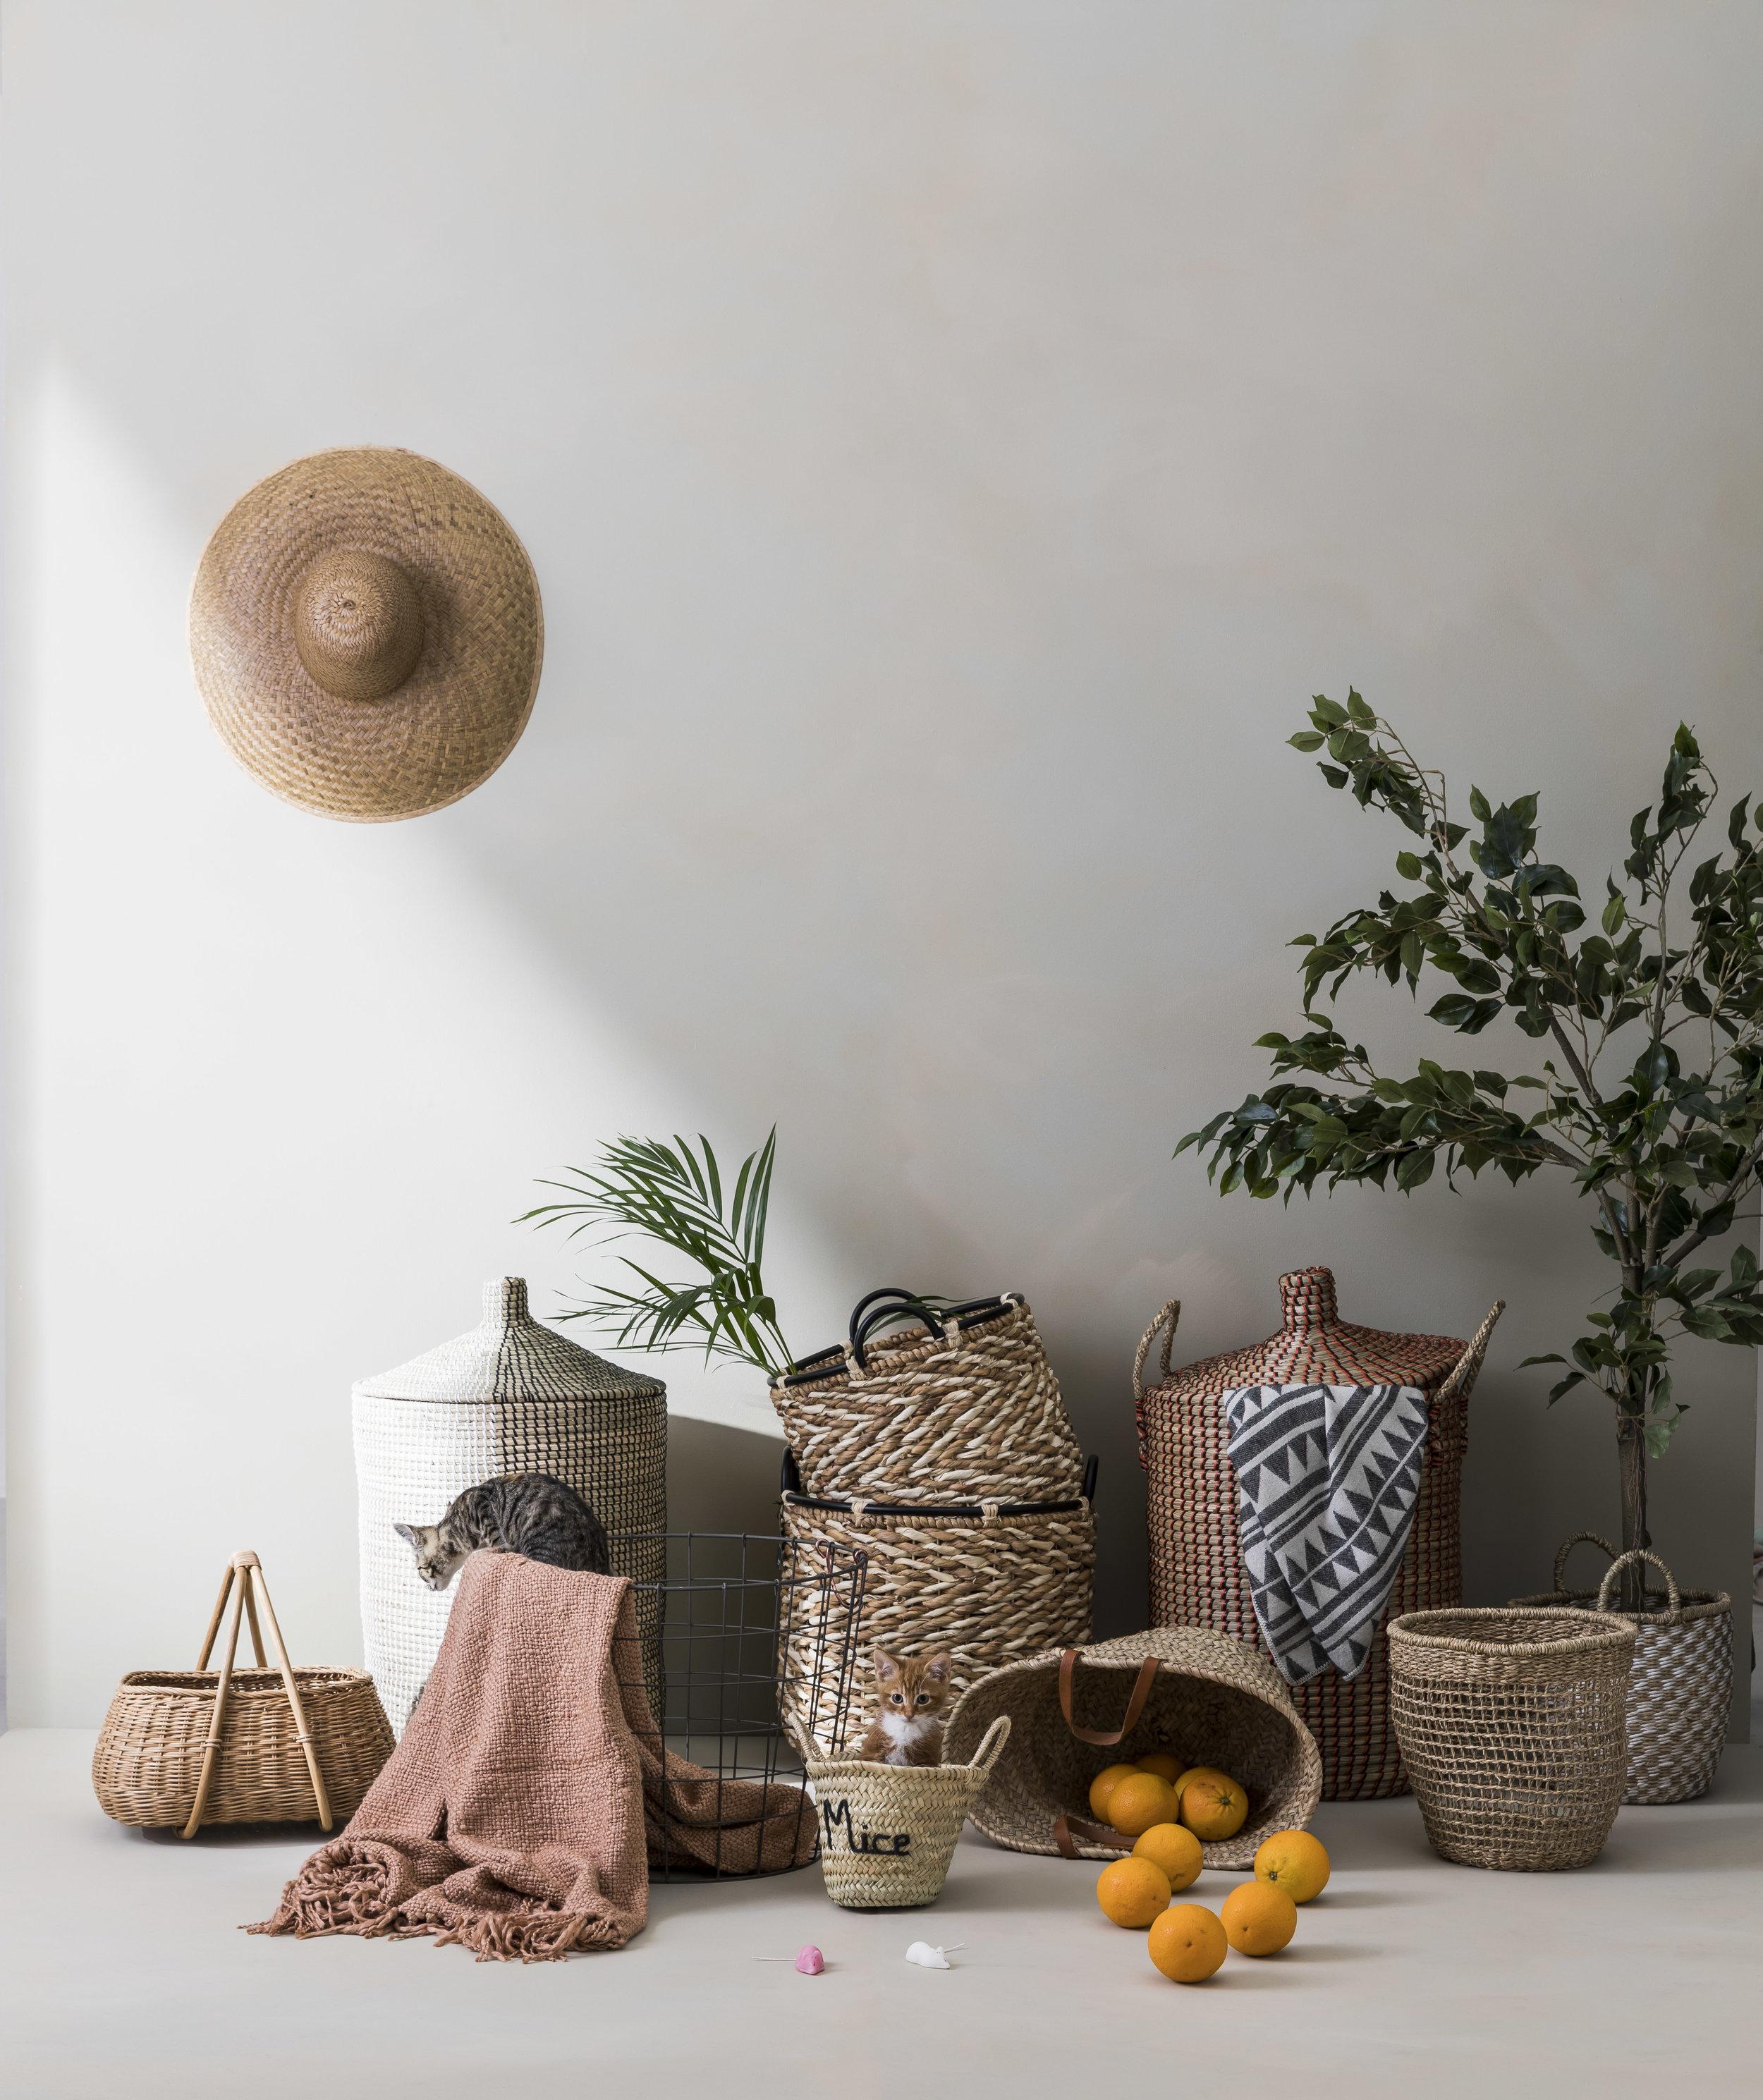 'Bag a Basket'